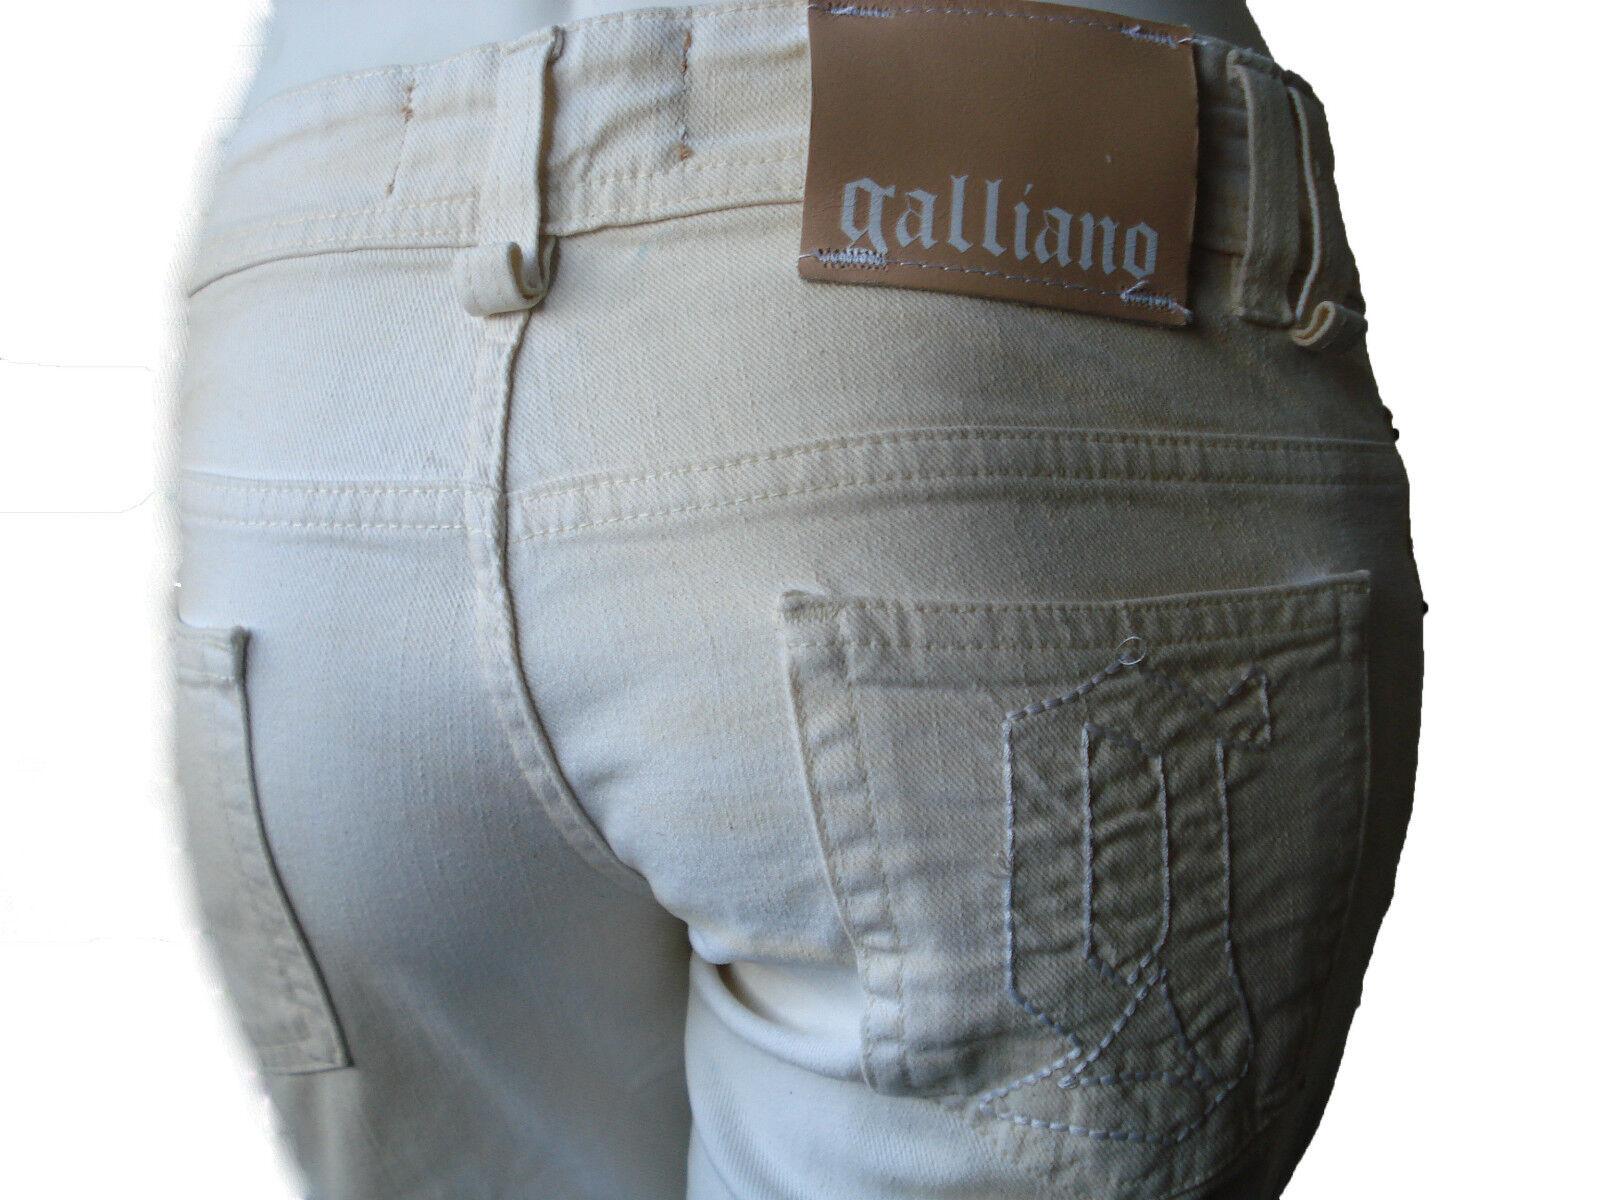 John Galliano Jeans Pants Denim Beige Hose Röhre Slim Neu